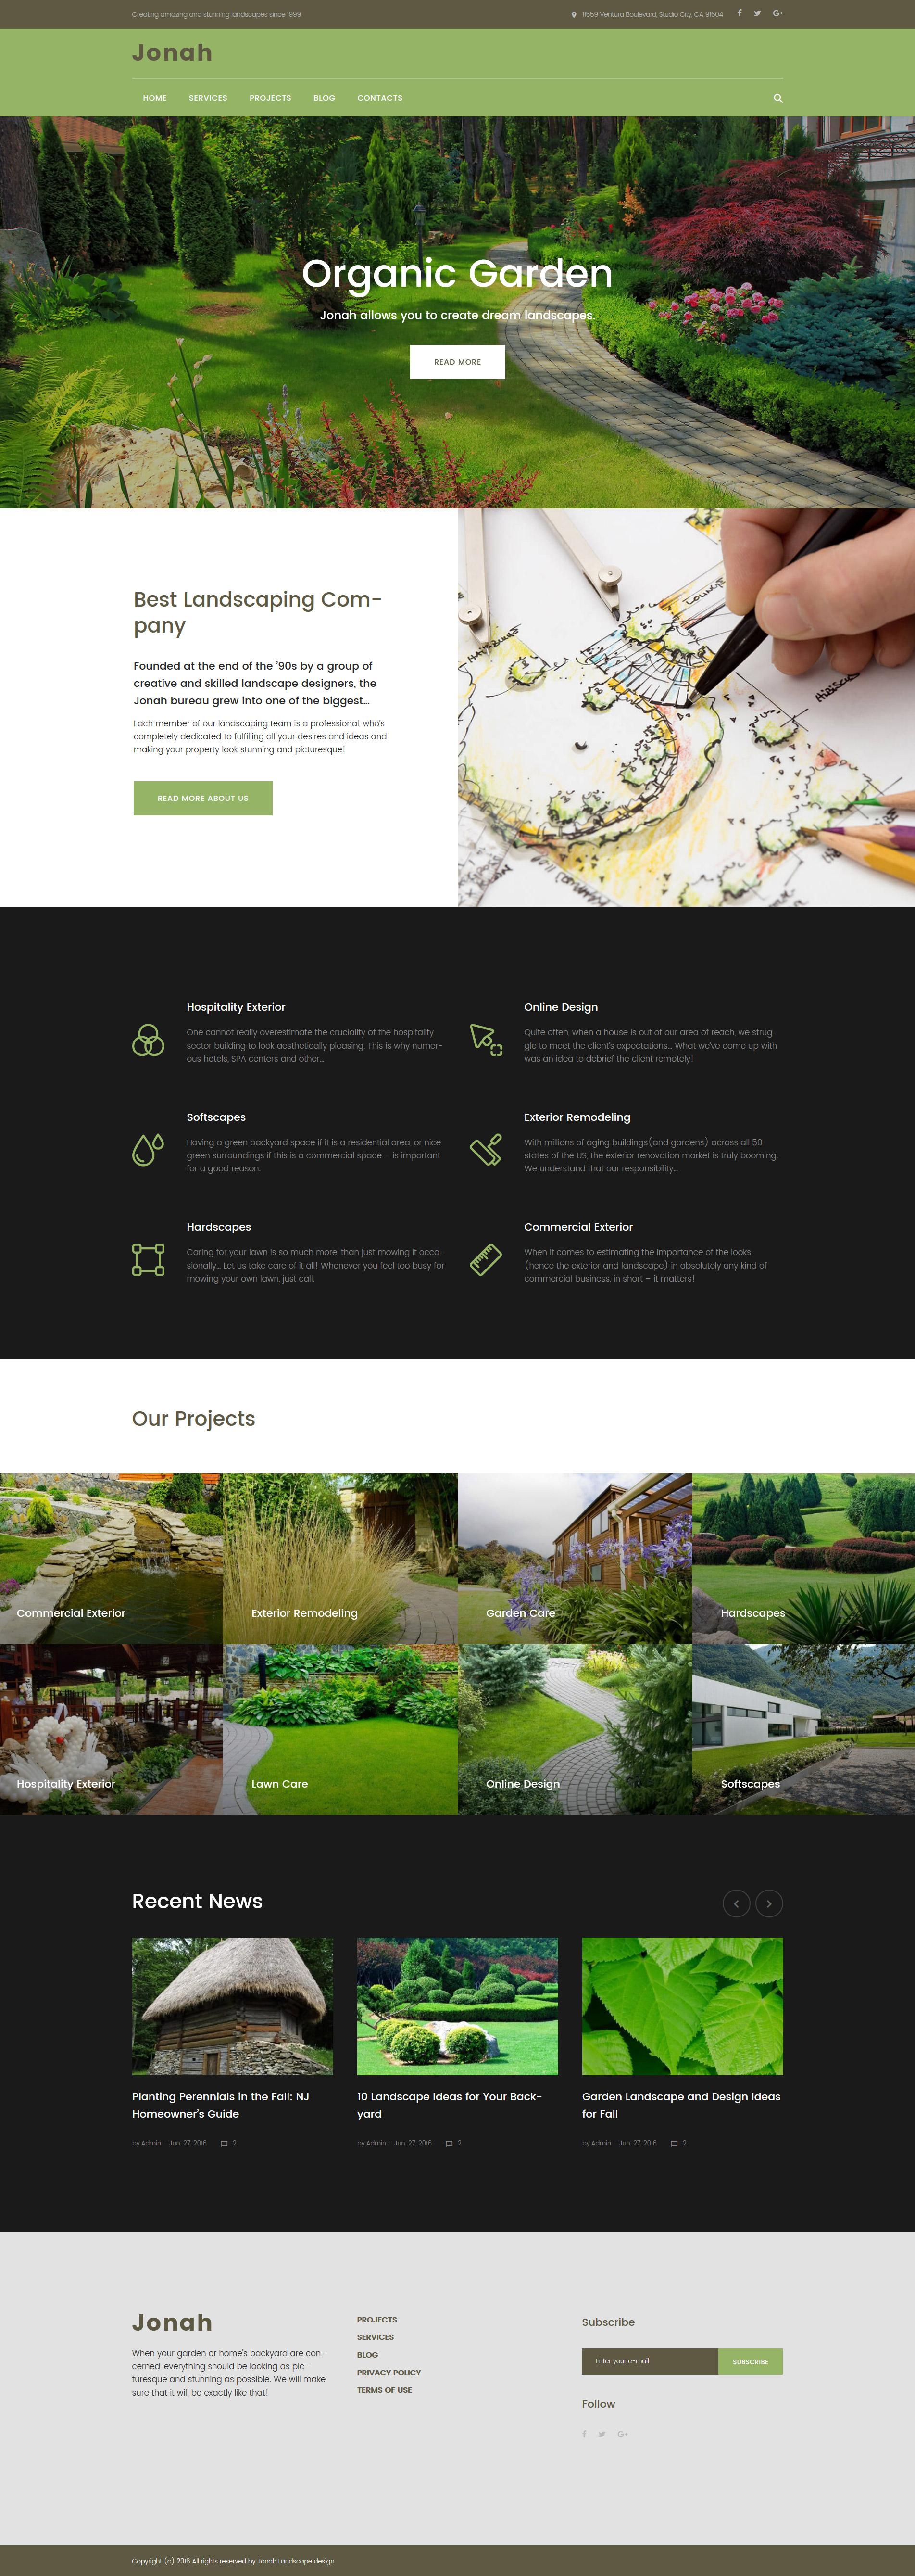 Responsive Jonah - Landscape Design and Lawn Mowing Wordpress #61319